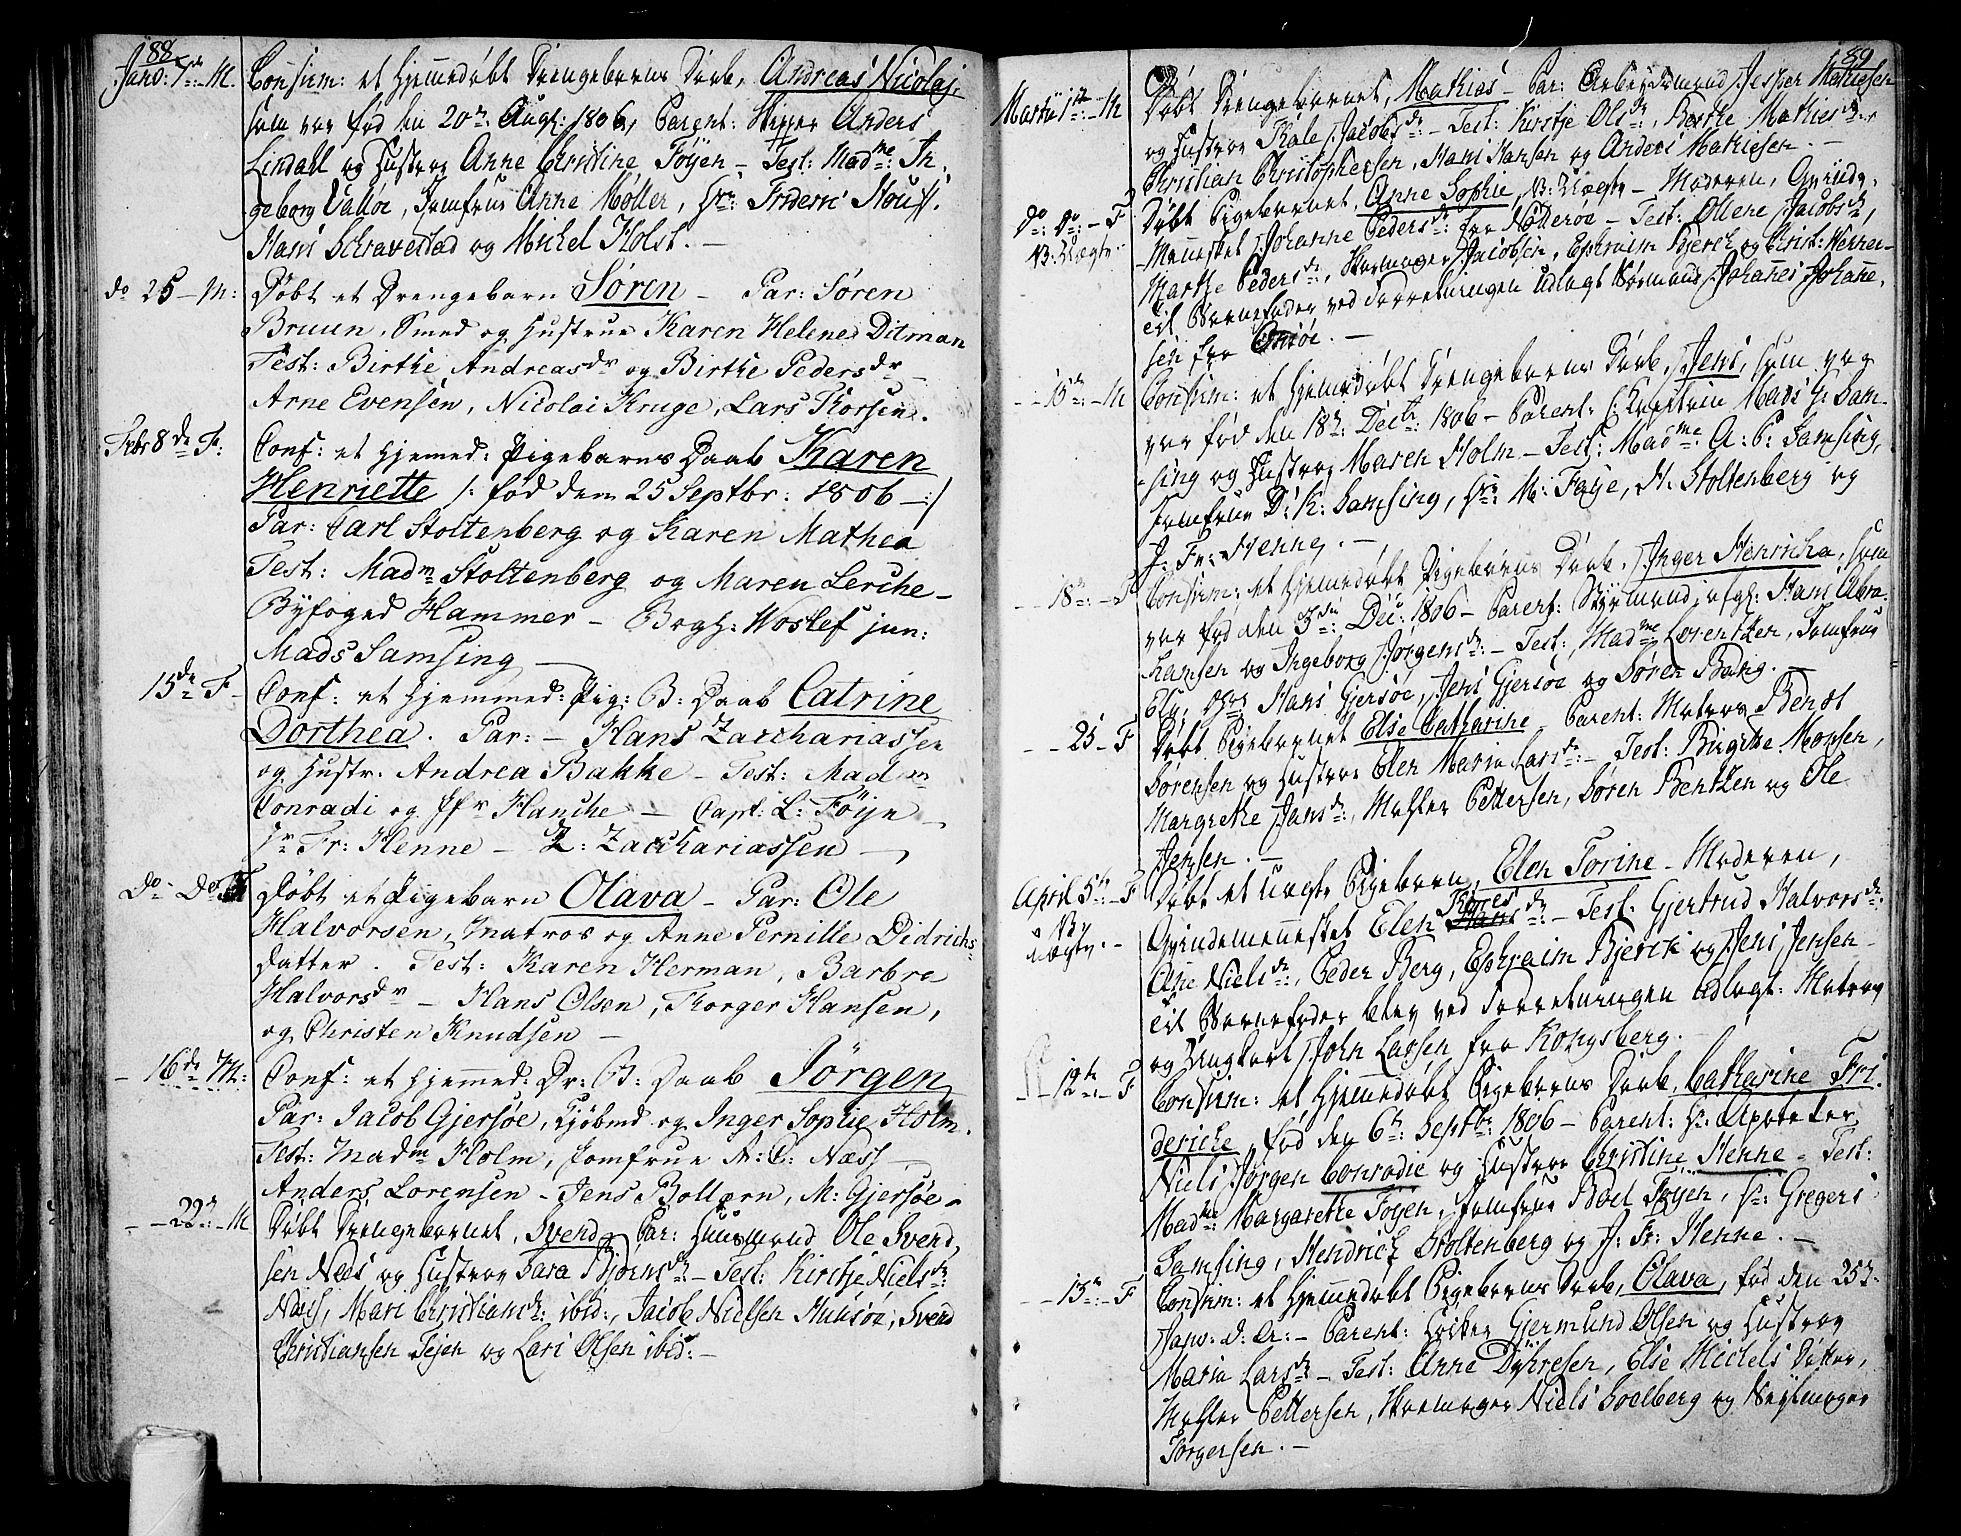 SAKO, Tønsberg kirkebøker, F/Fa/L0003: Ministerialbok nr. I 3, 1797-1814, s. 88-89